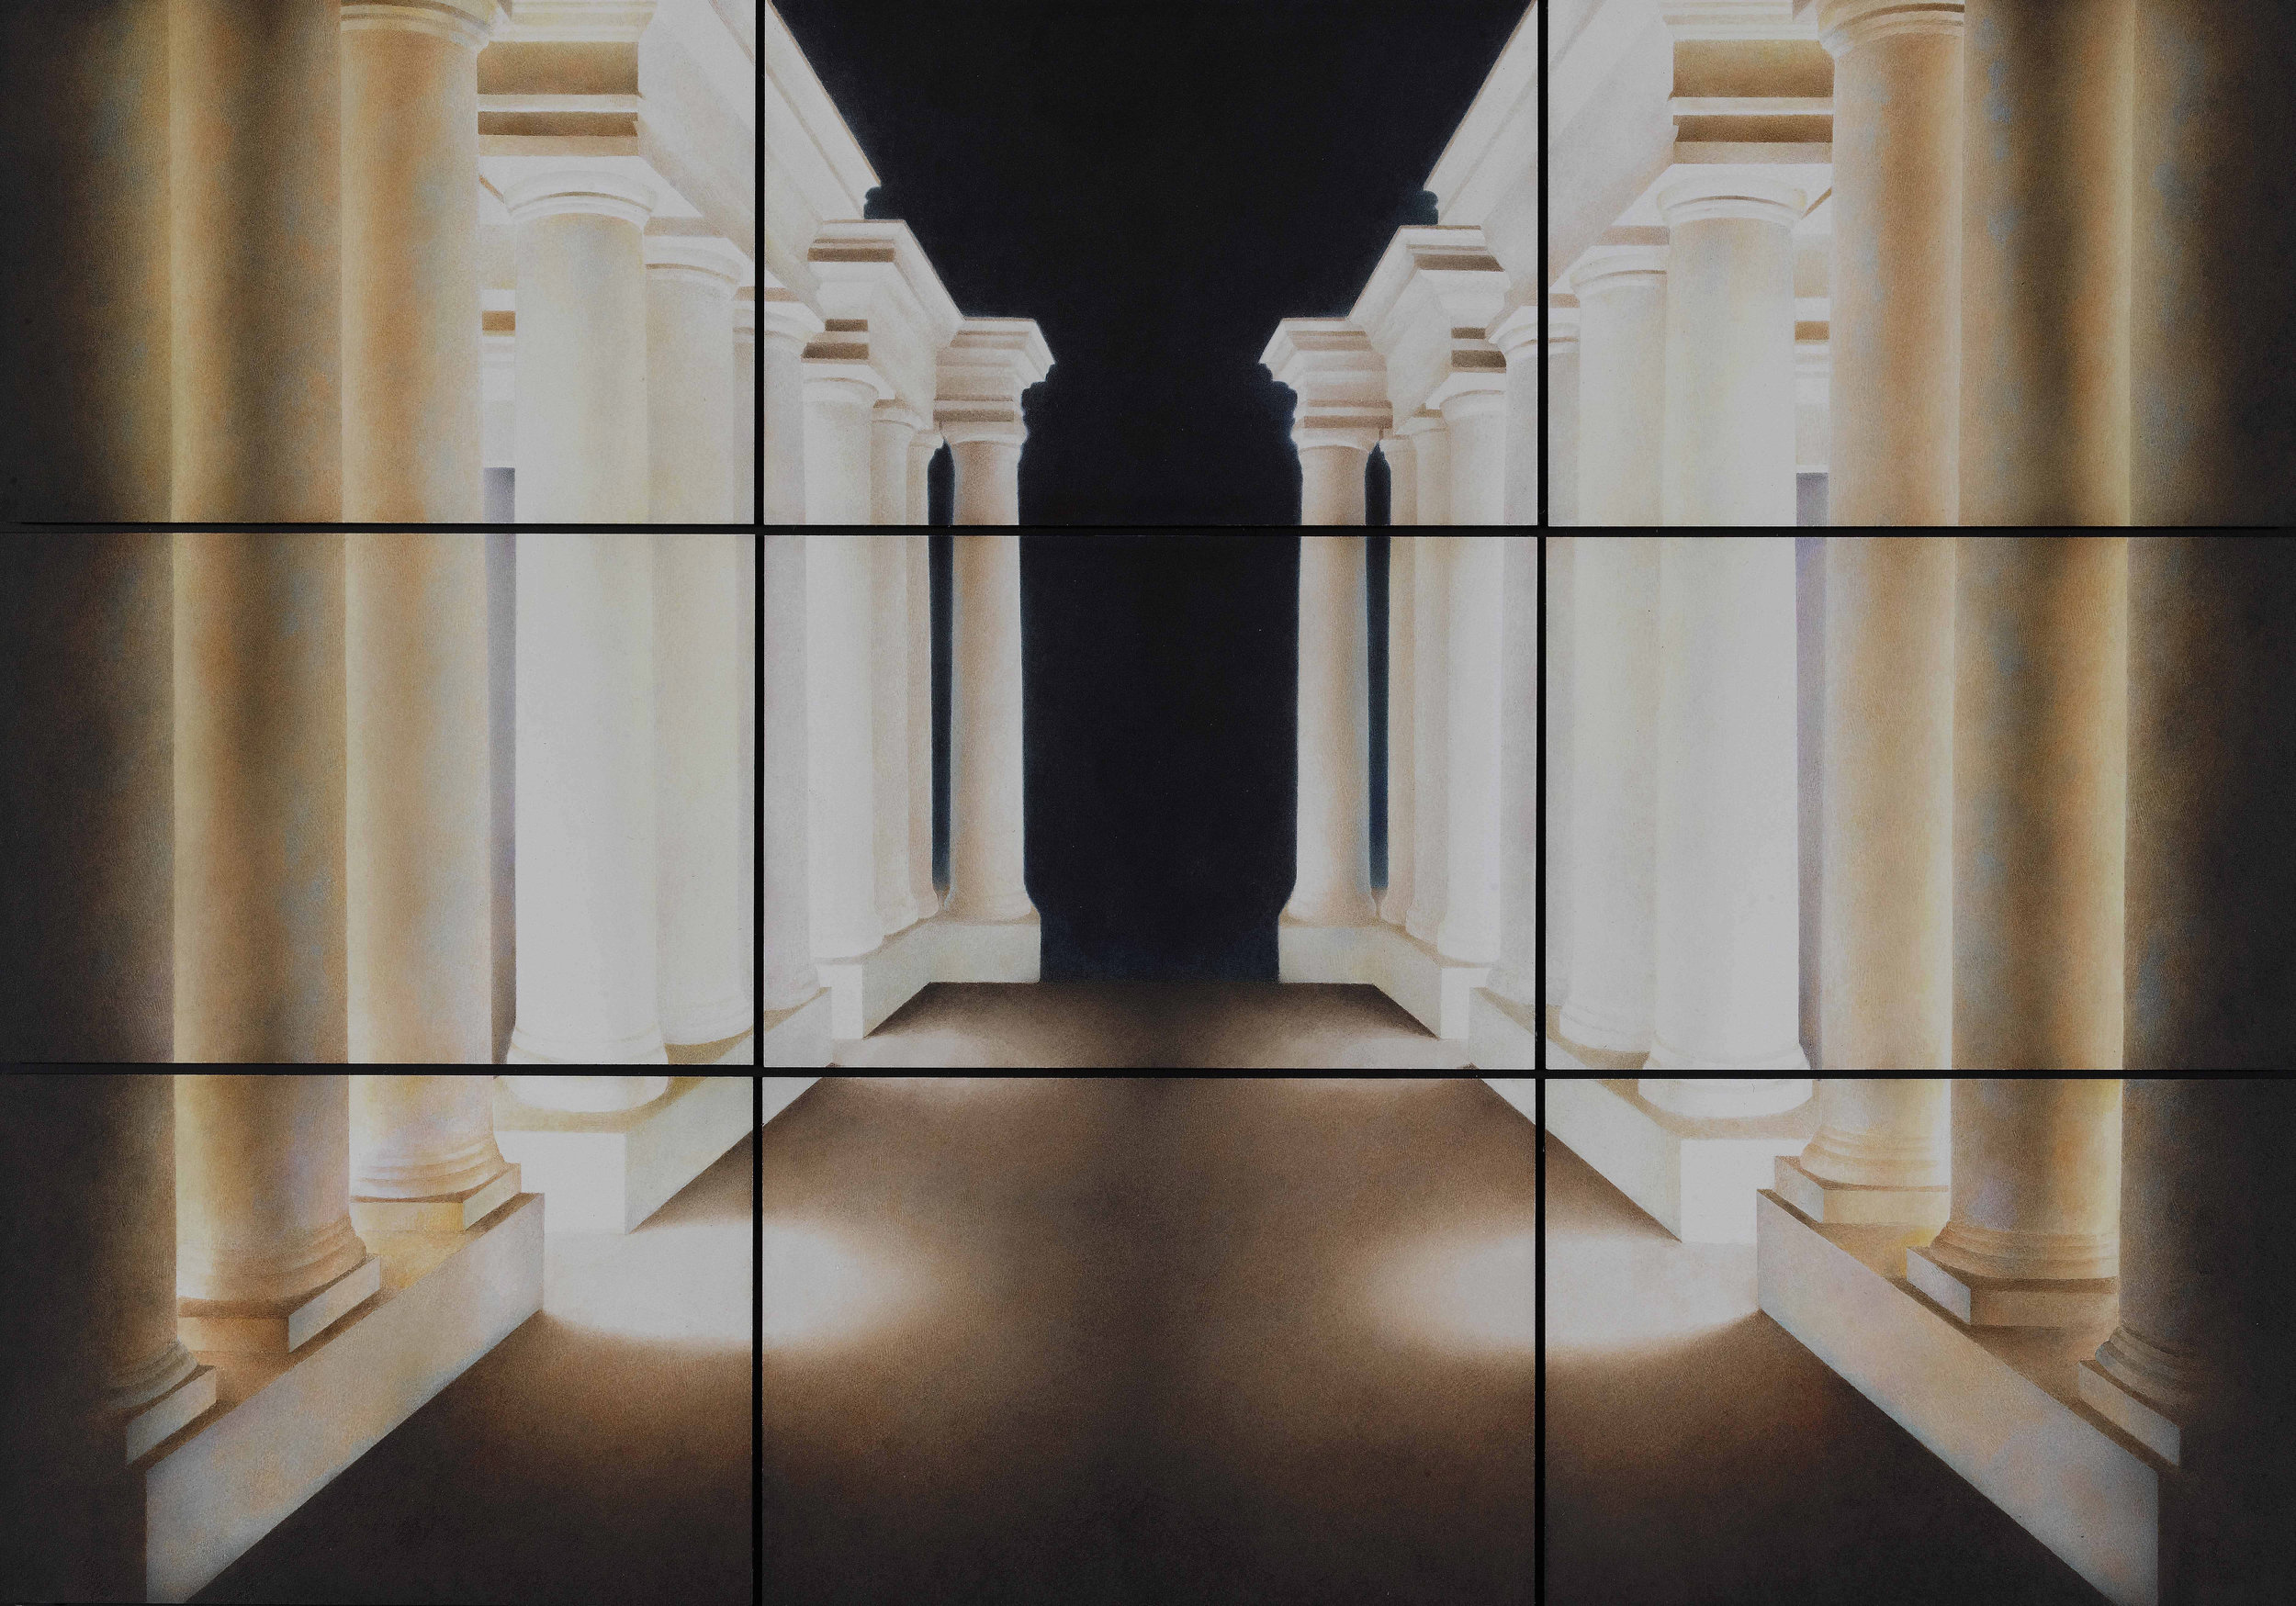 Liu Liu 刘流, Light, Air and Emotion 光、空气与情感, 2018, Watercolor on paper 纸上水彩, 54 x 78 cm